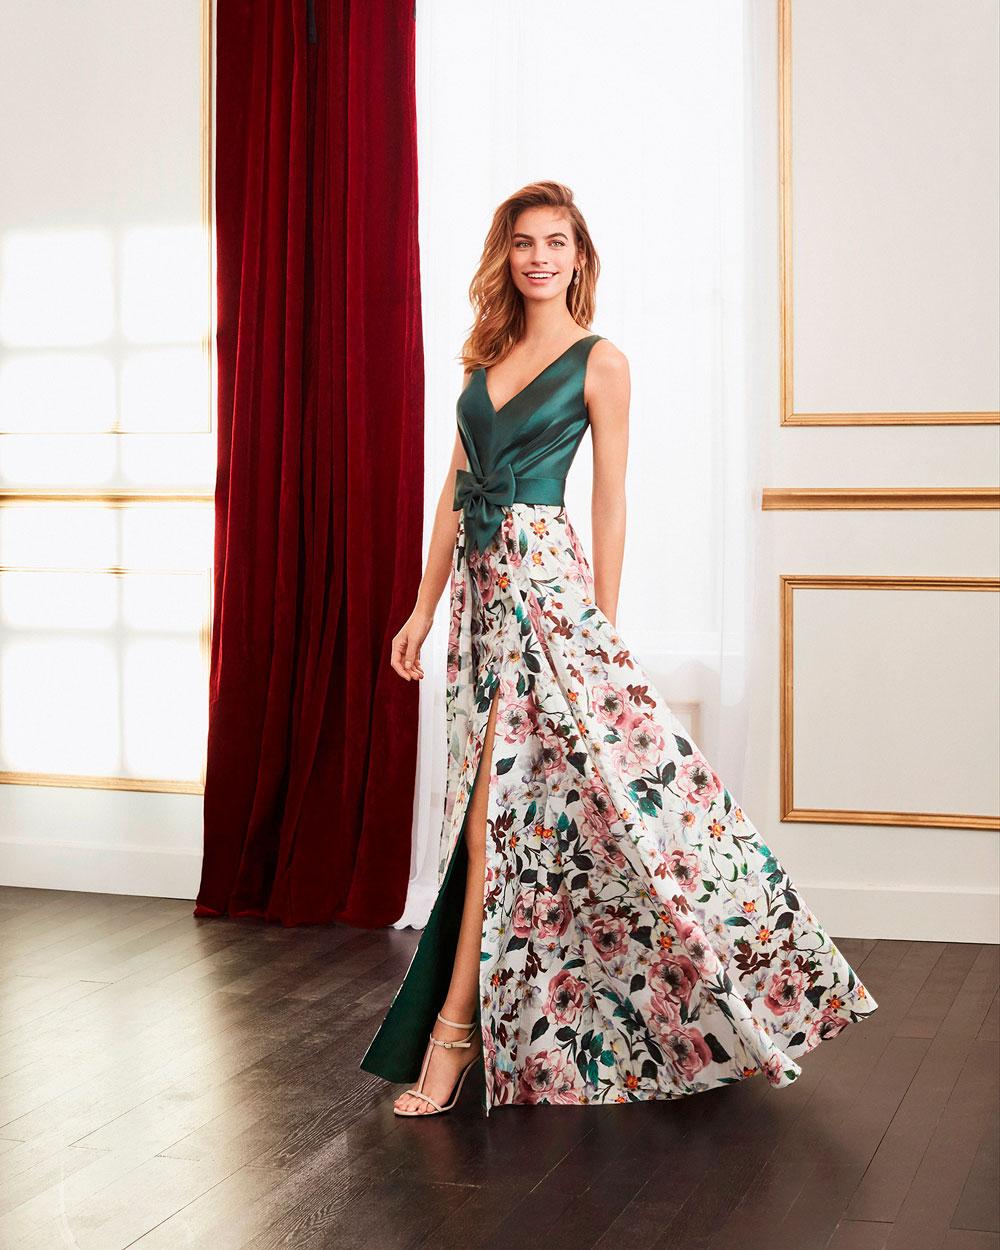 vestido de fiesta 2020 4J2D3 MARFIL BARCELONA 1